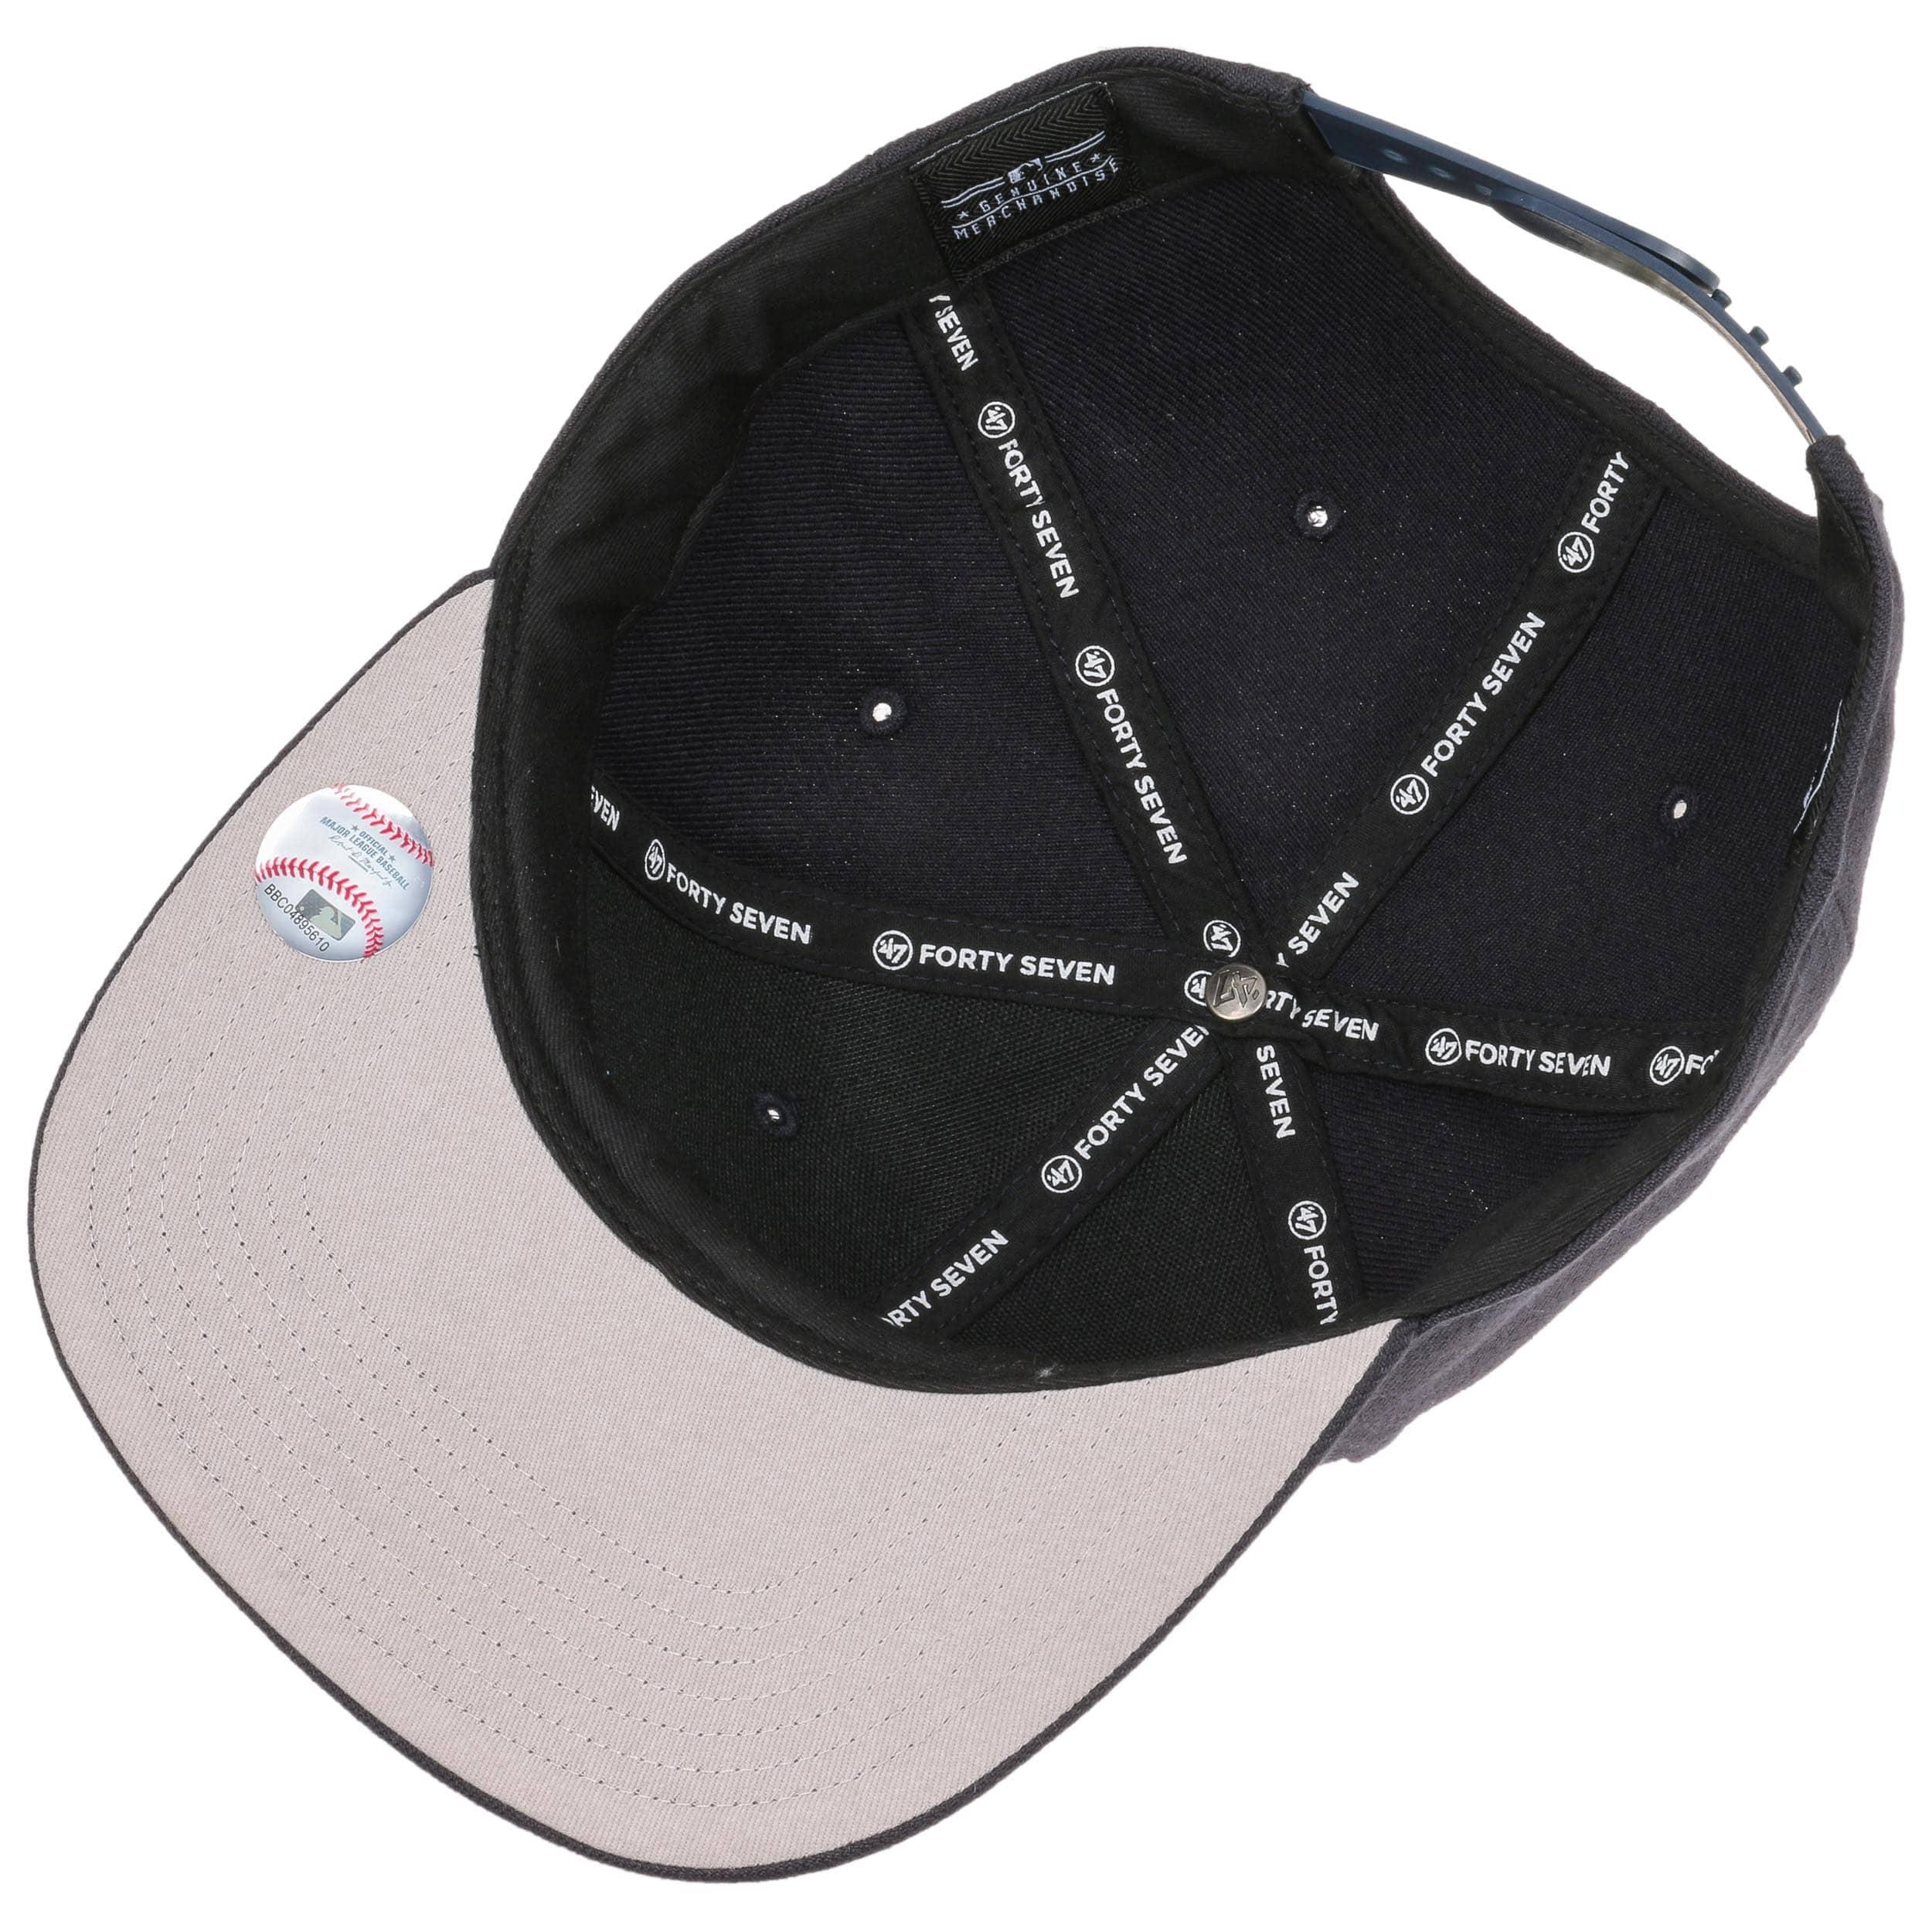 09a3ab1d42b ... NoShot Red Sox Snapback Cap by 47 Brand - navy 2 ...